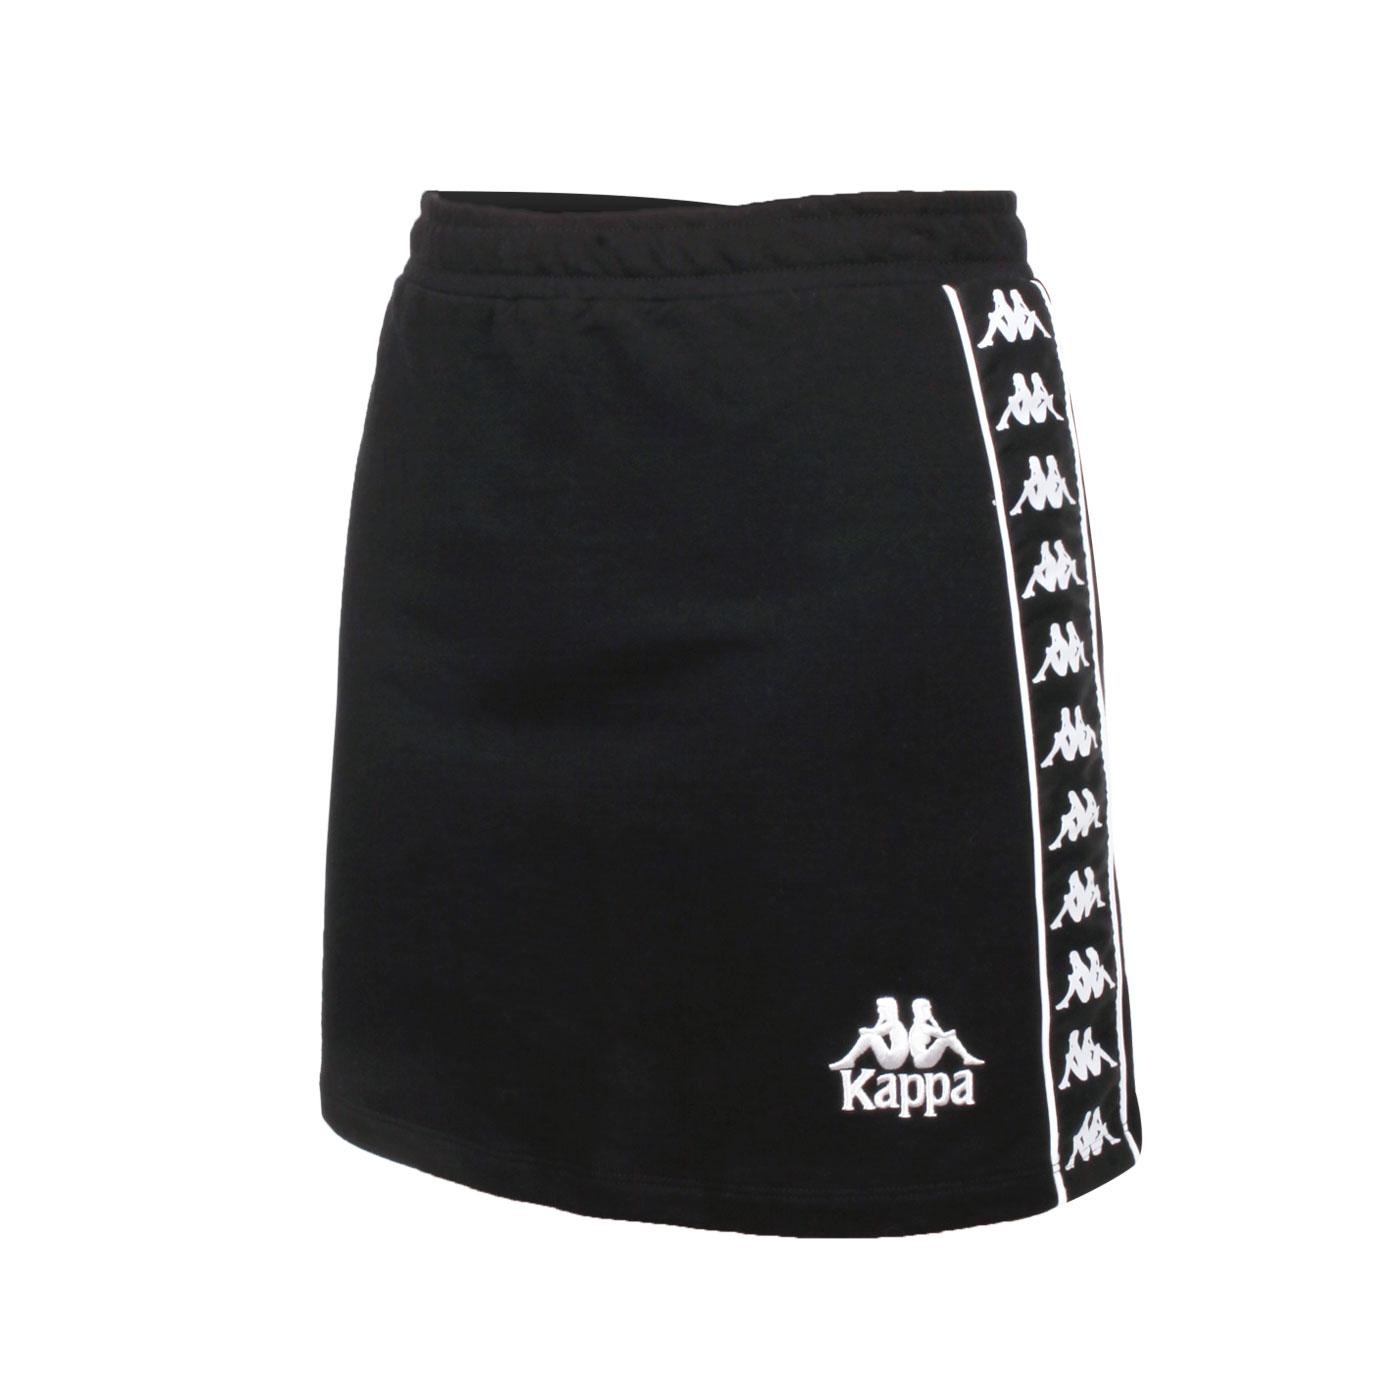 KAPPA 女款短裙 35154YW-005